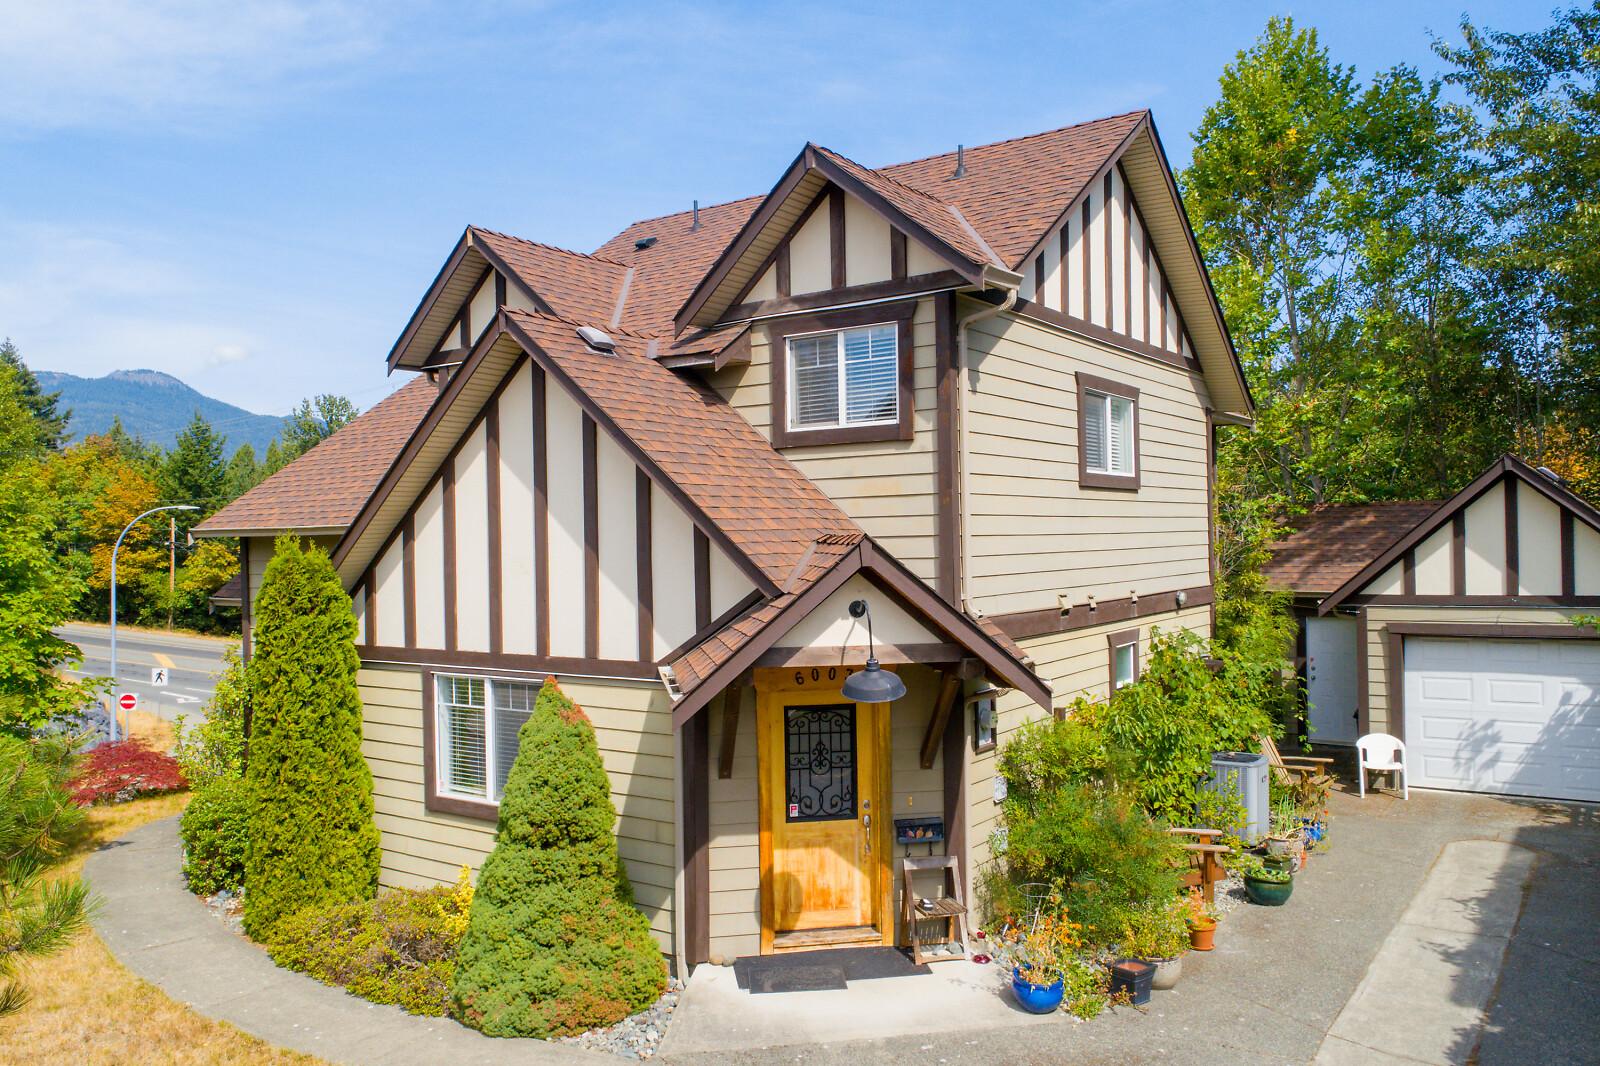 6003 Stonehaven Drive, Duncan, British Columbia  V9L 0A1 - Photo 2 - 885028